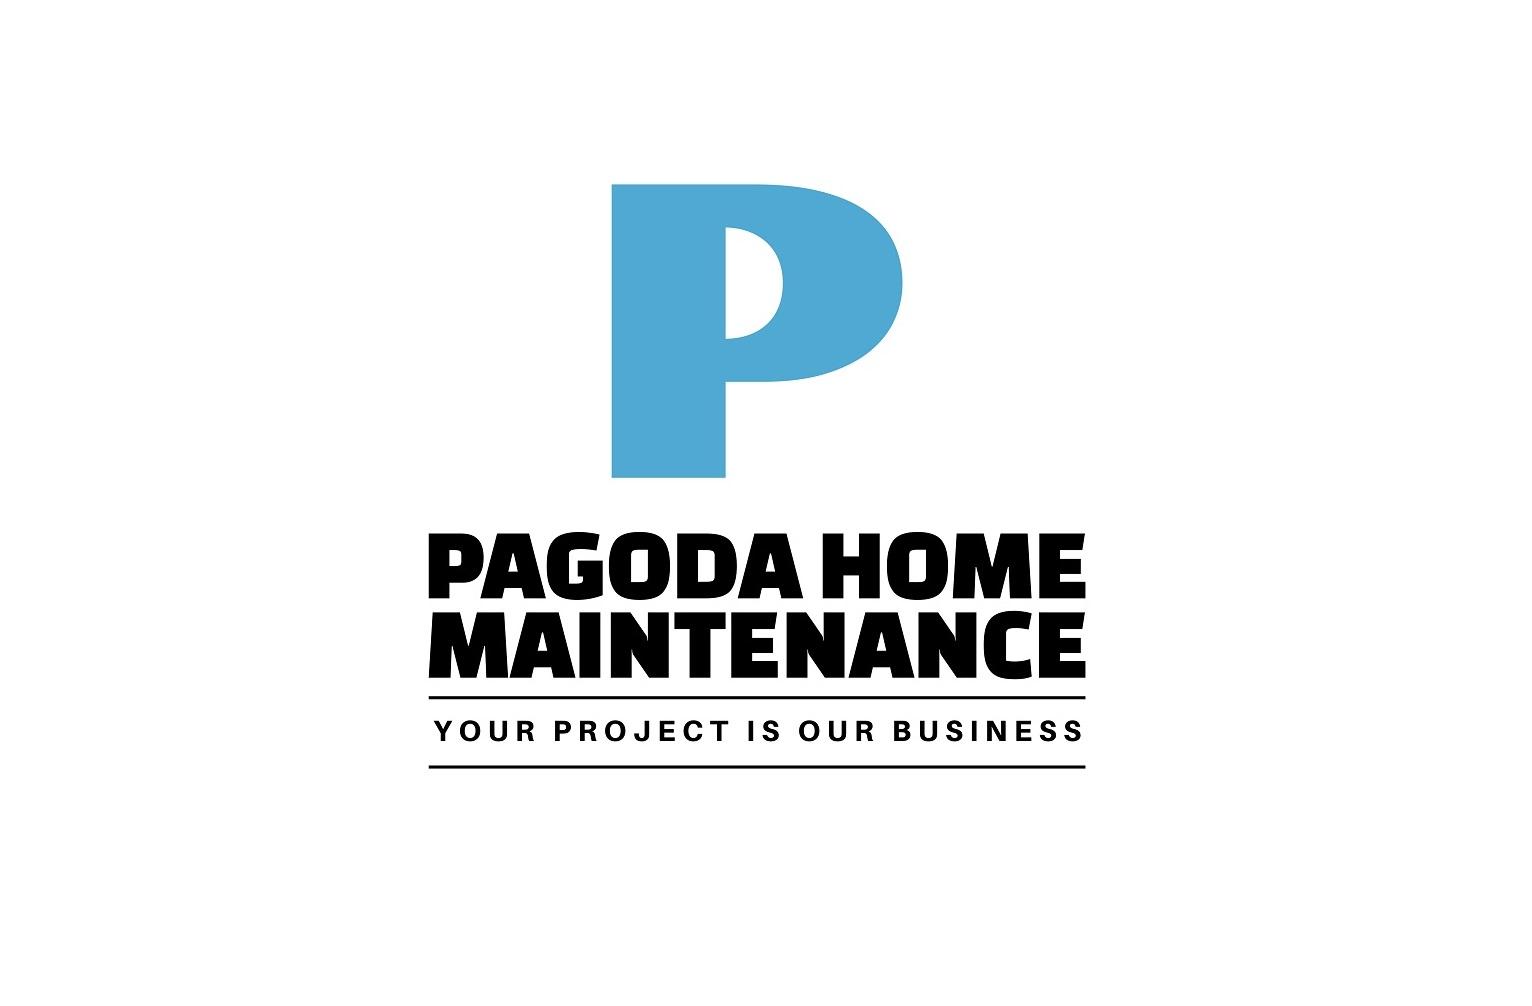 Pagoda Home Maintenance